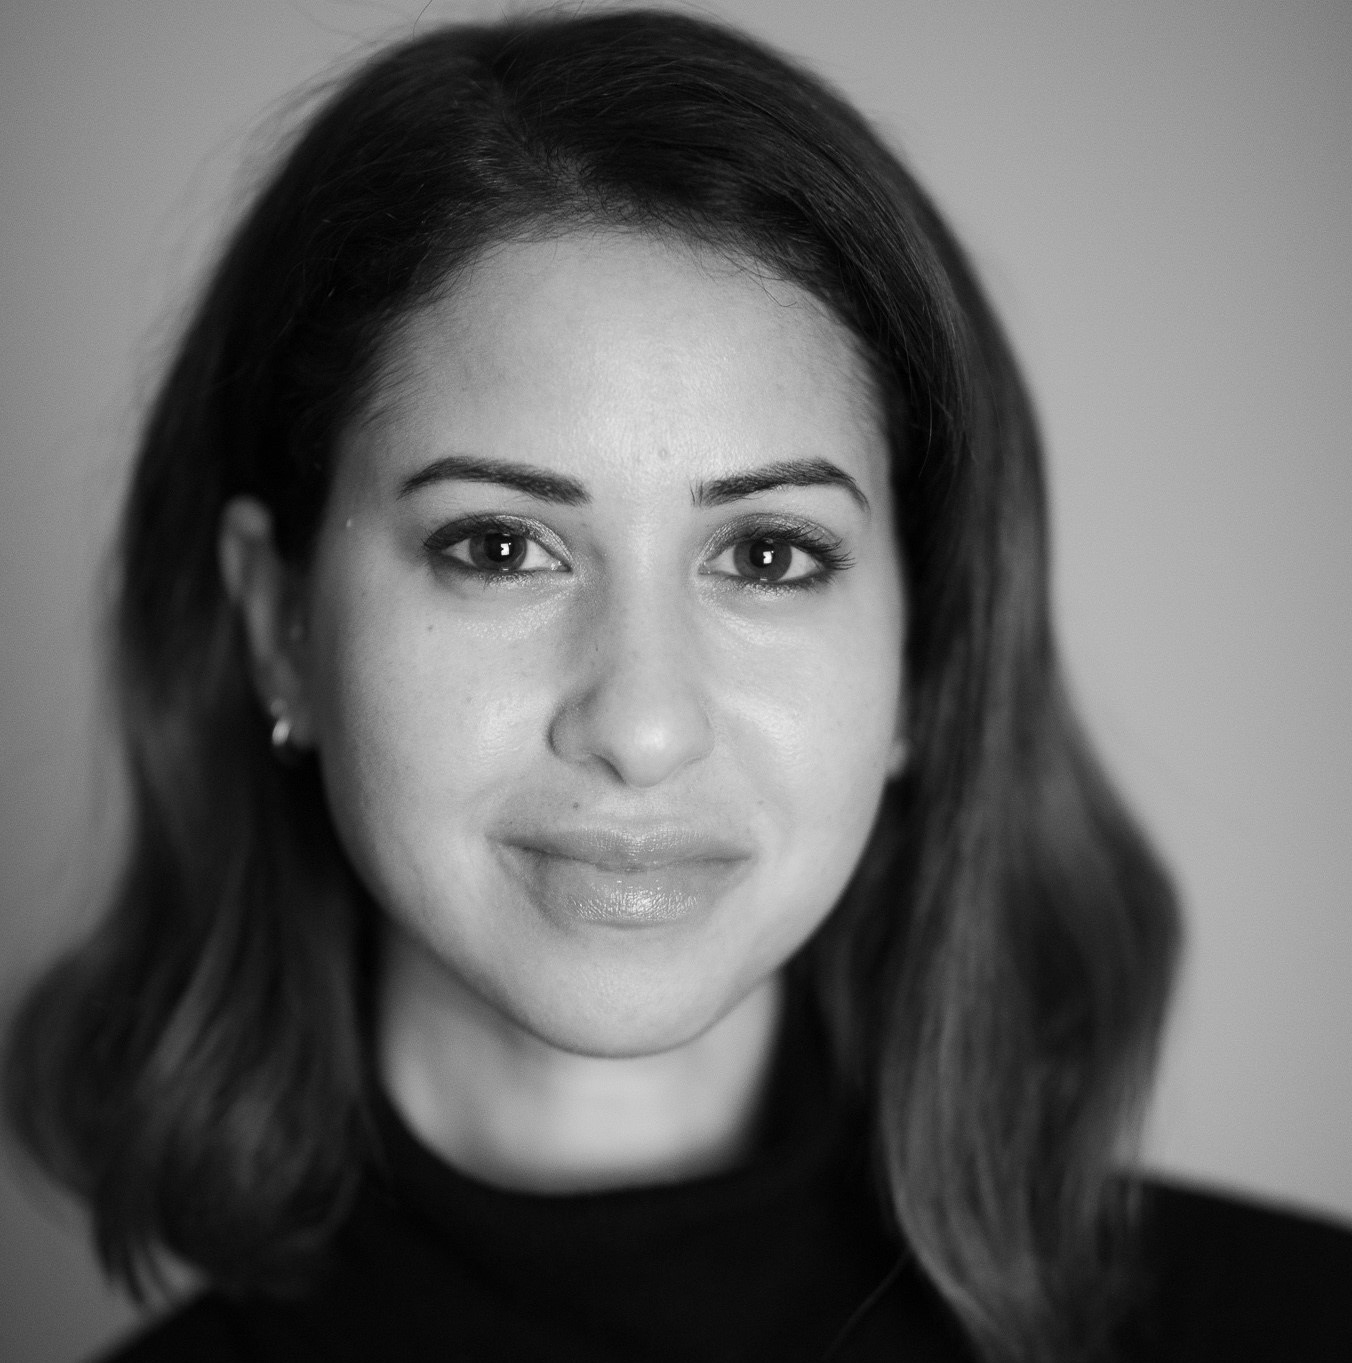 Jasmine El-Gamal